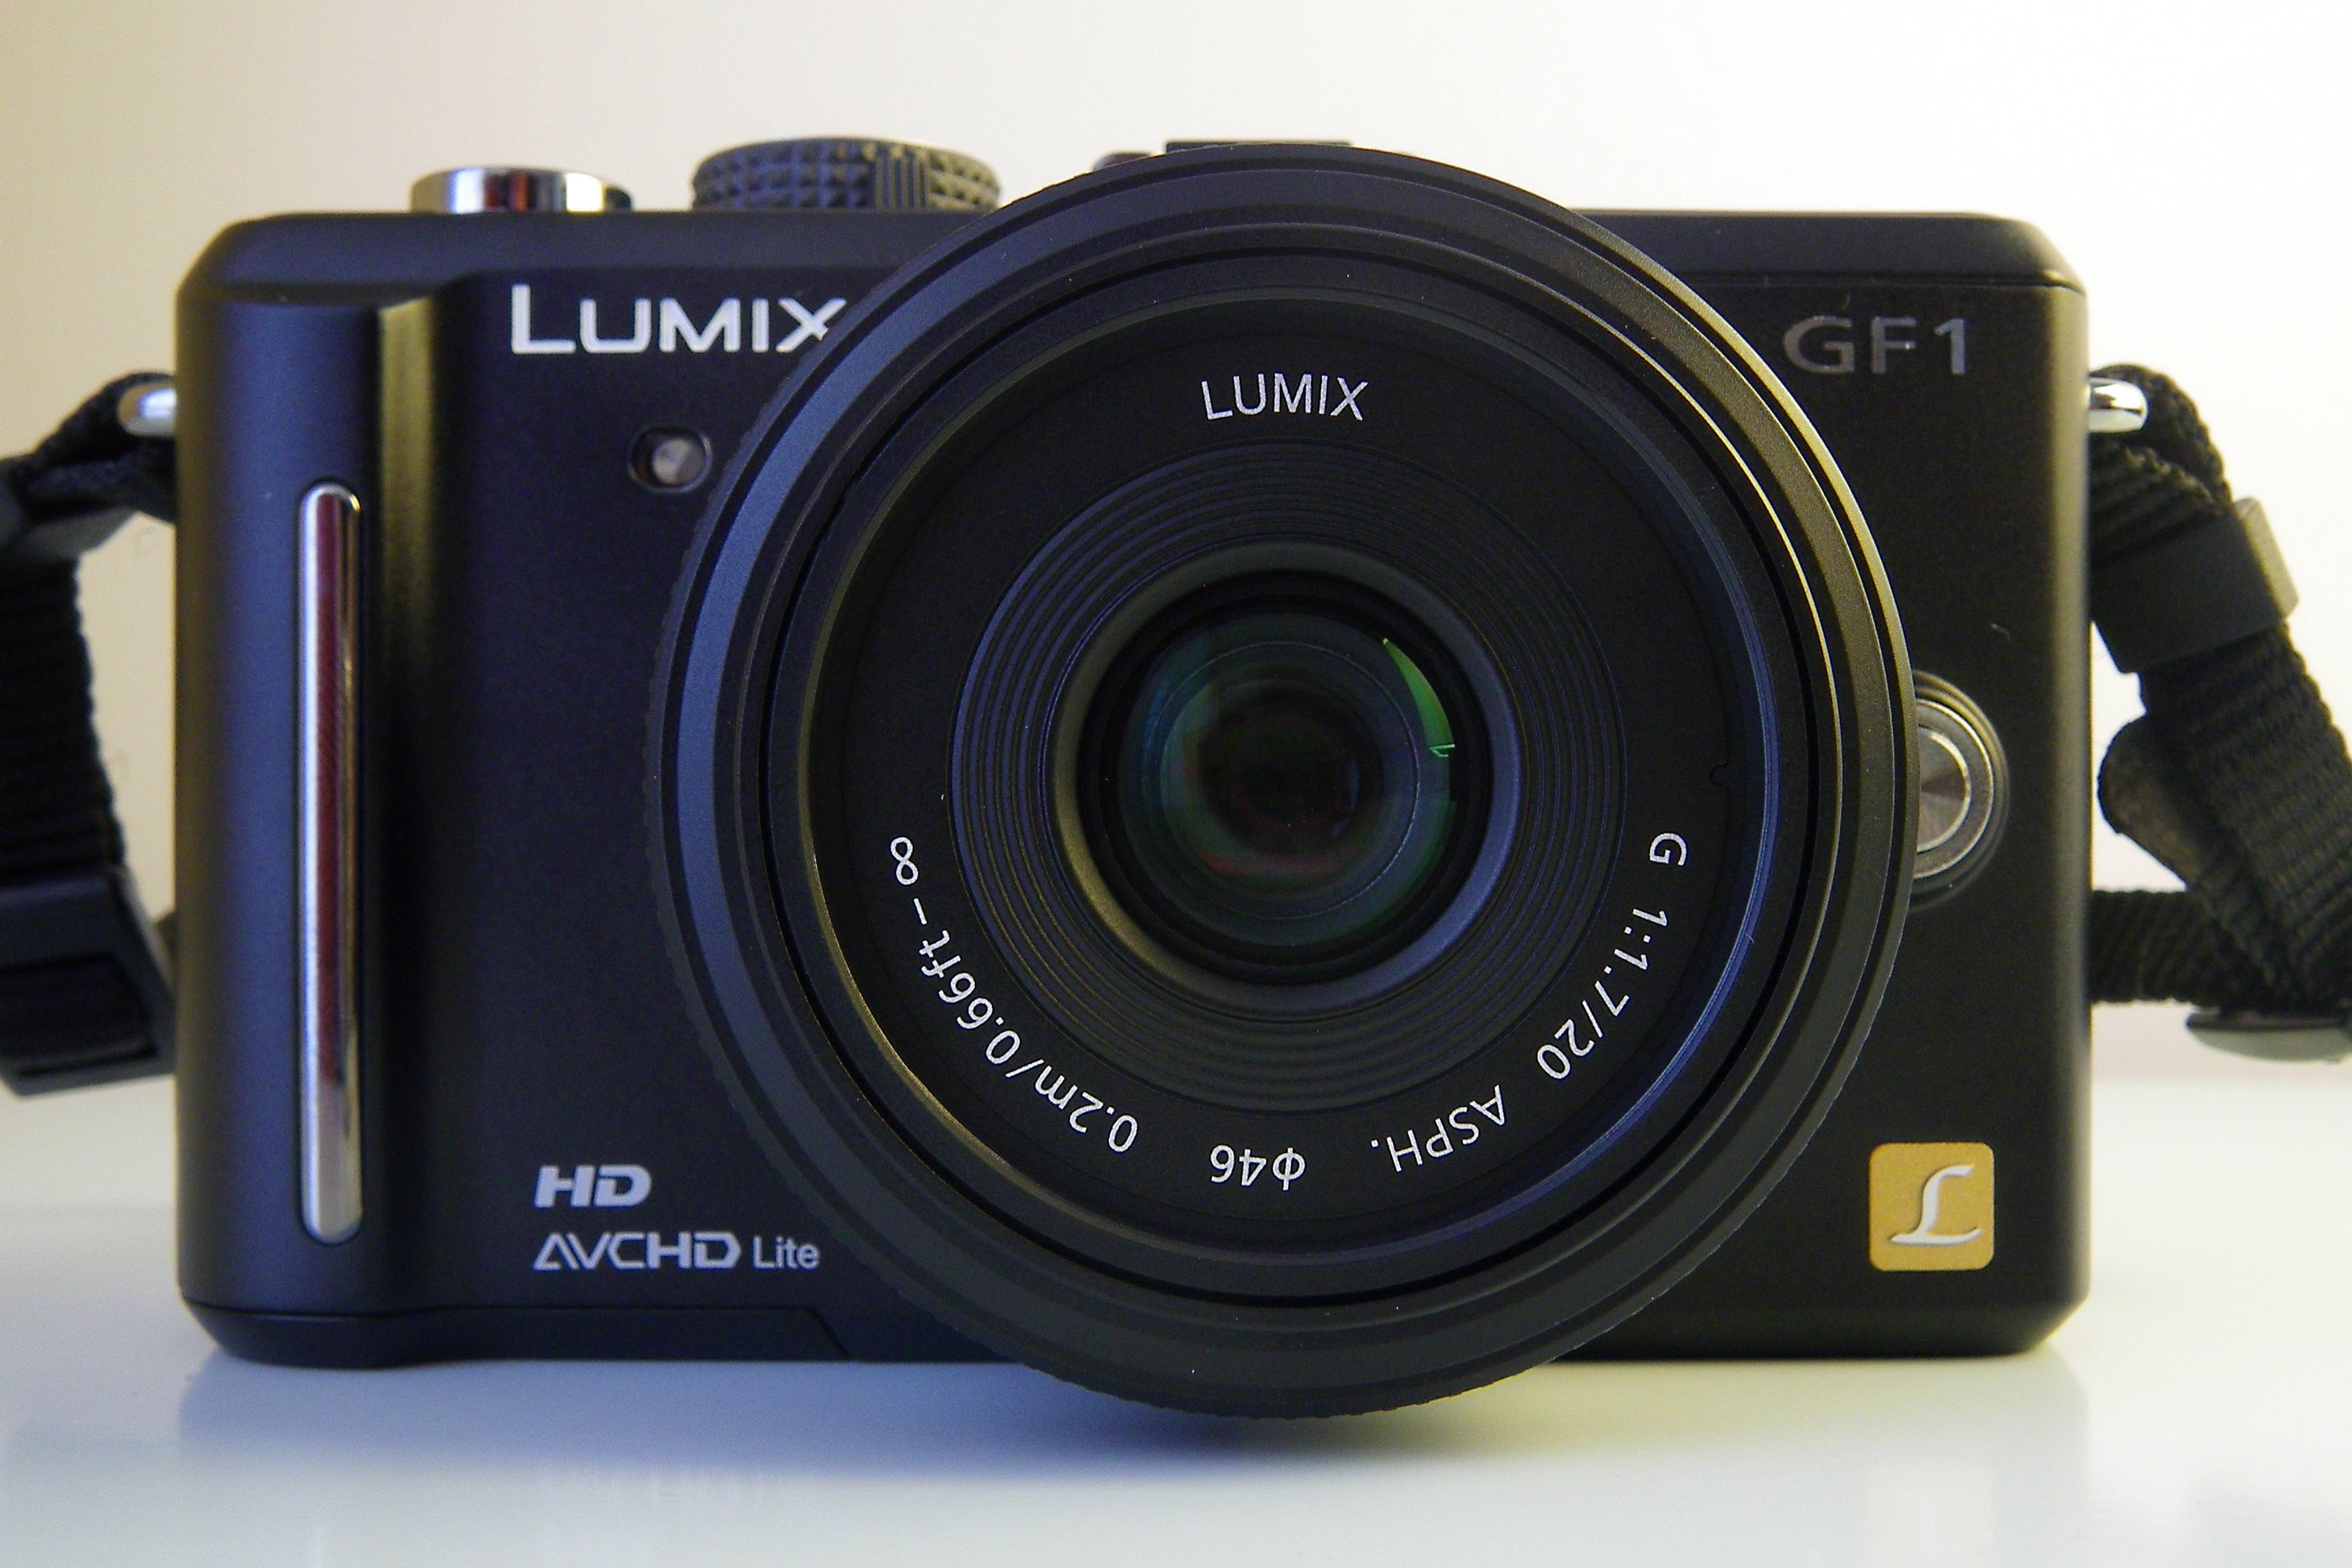 Panasonic Lumix DMC-GF1 front view